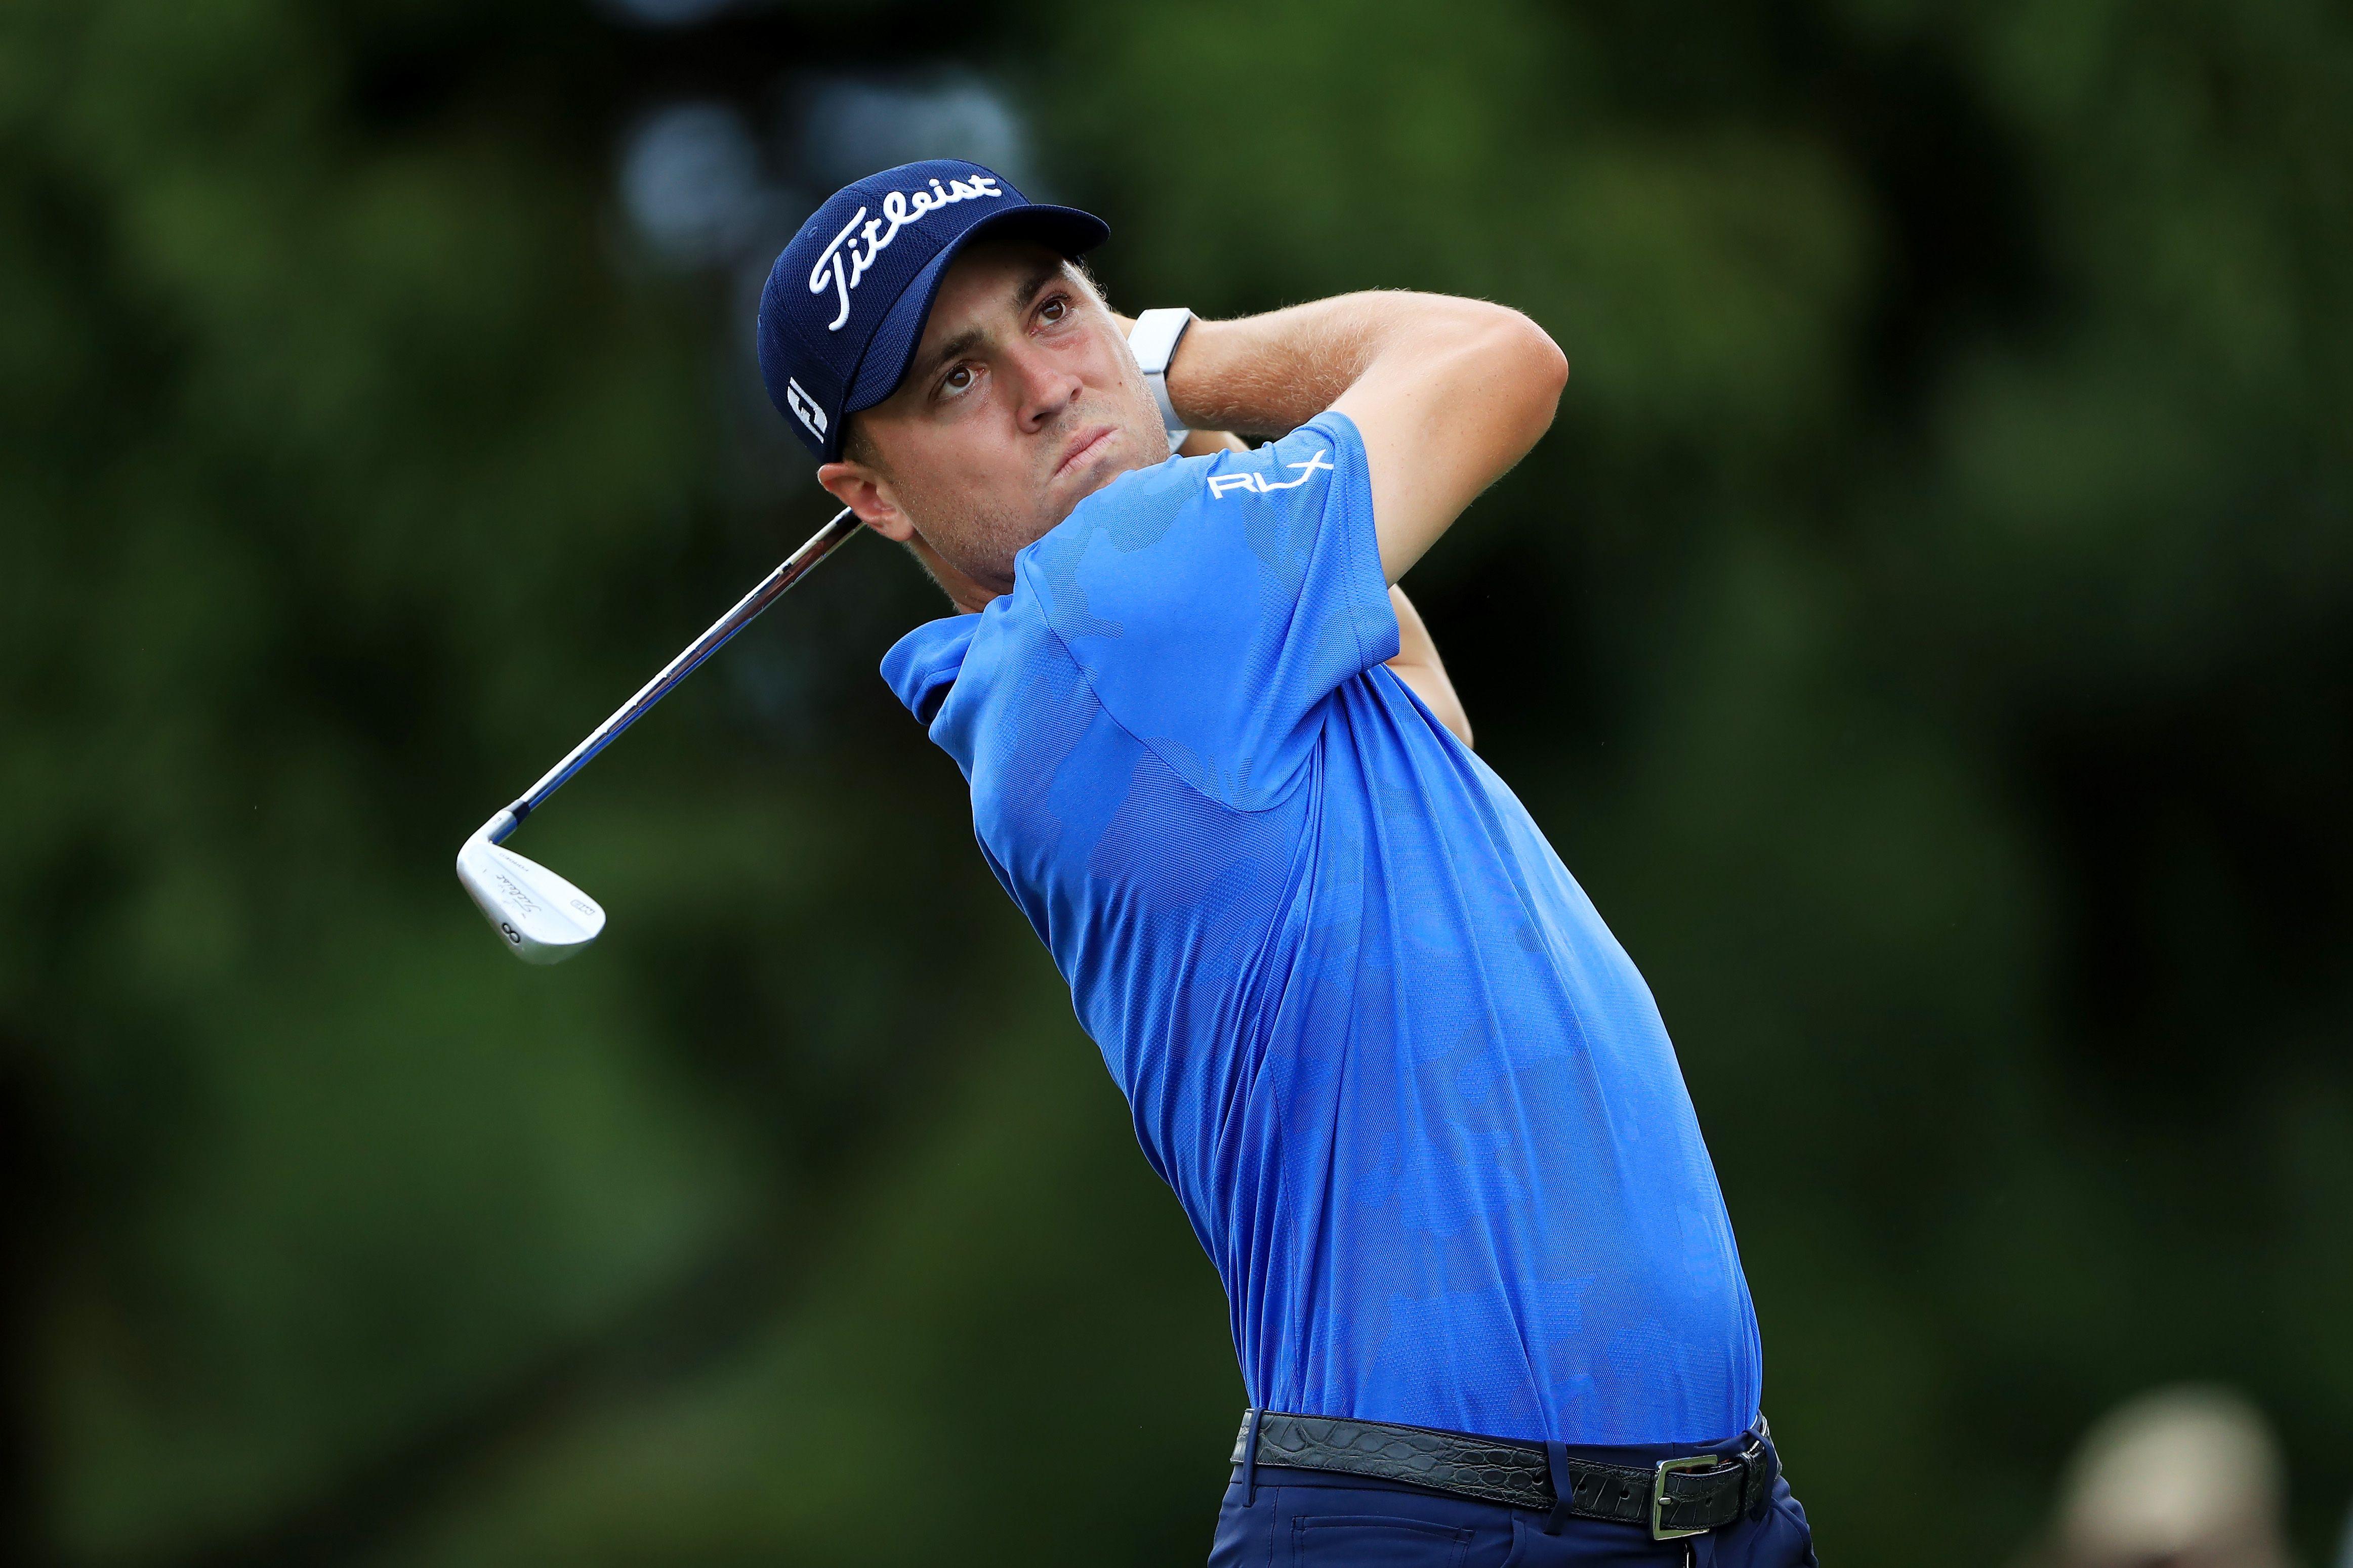 Golfer Justin Thomas Shares Melanoma Surgery Scar Photo On Instagram